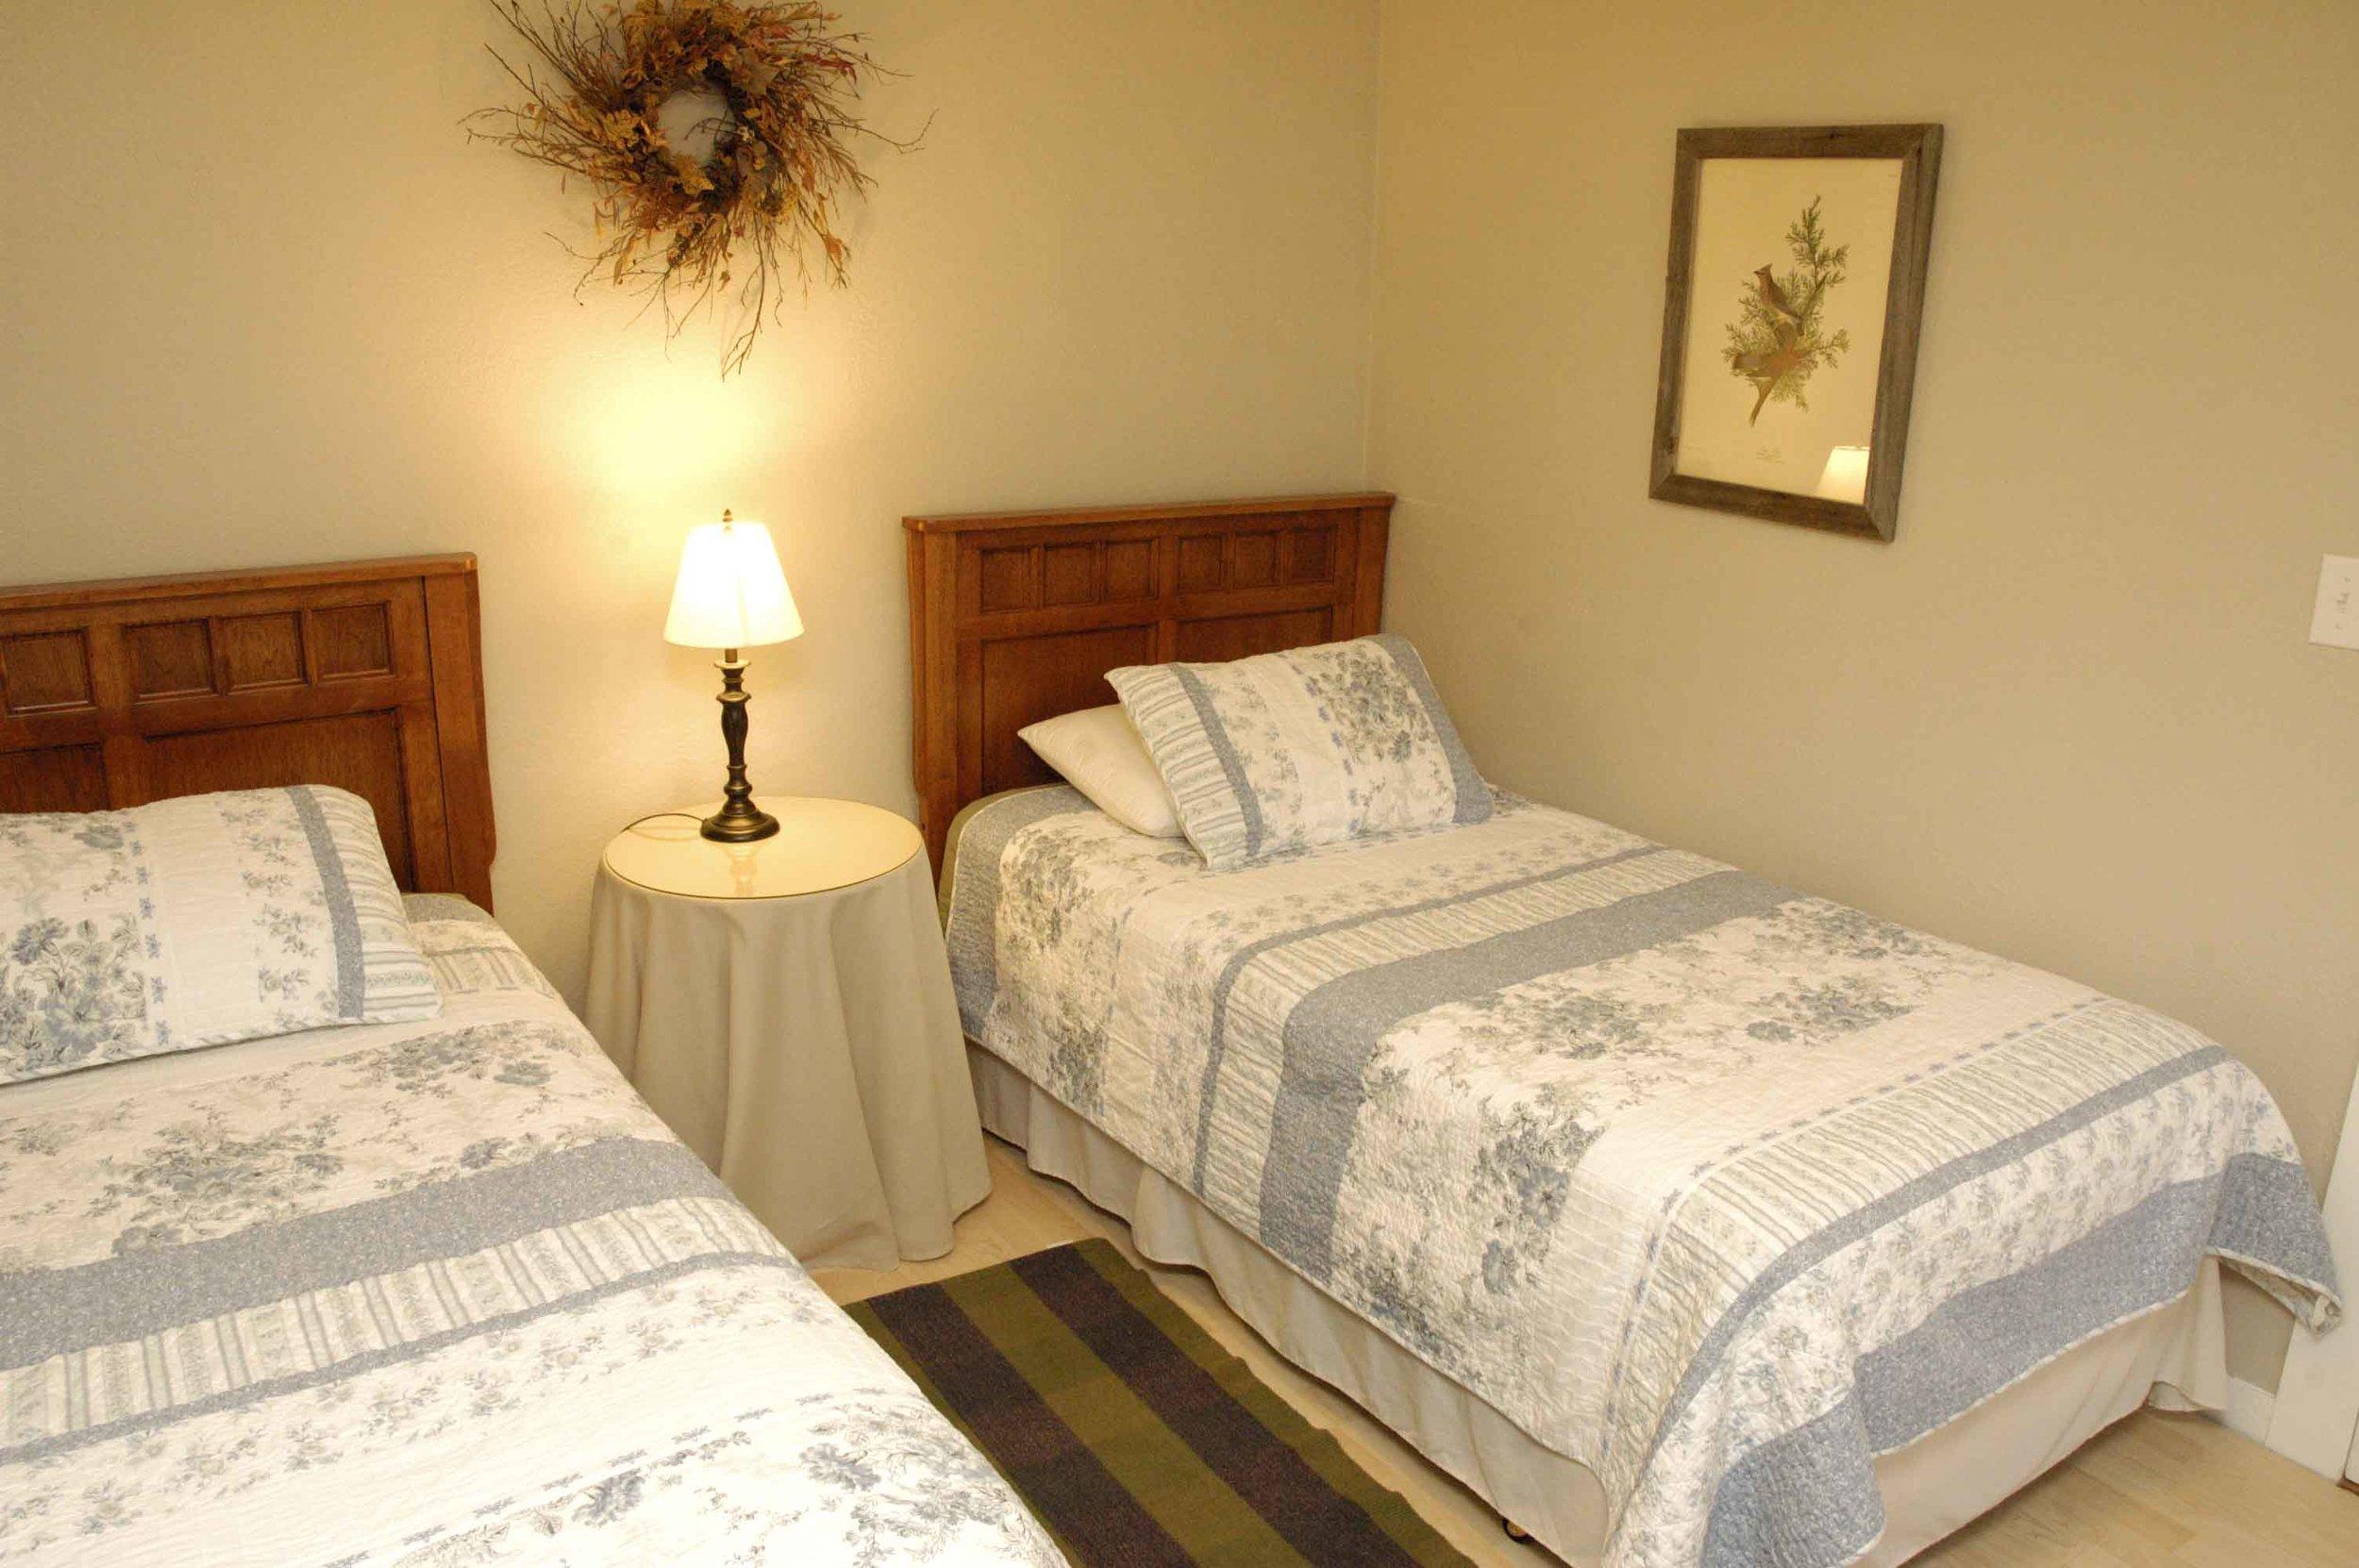 _DSC6709 kingfisher bedroom 2.jpg